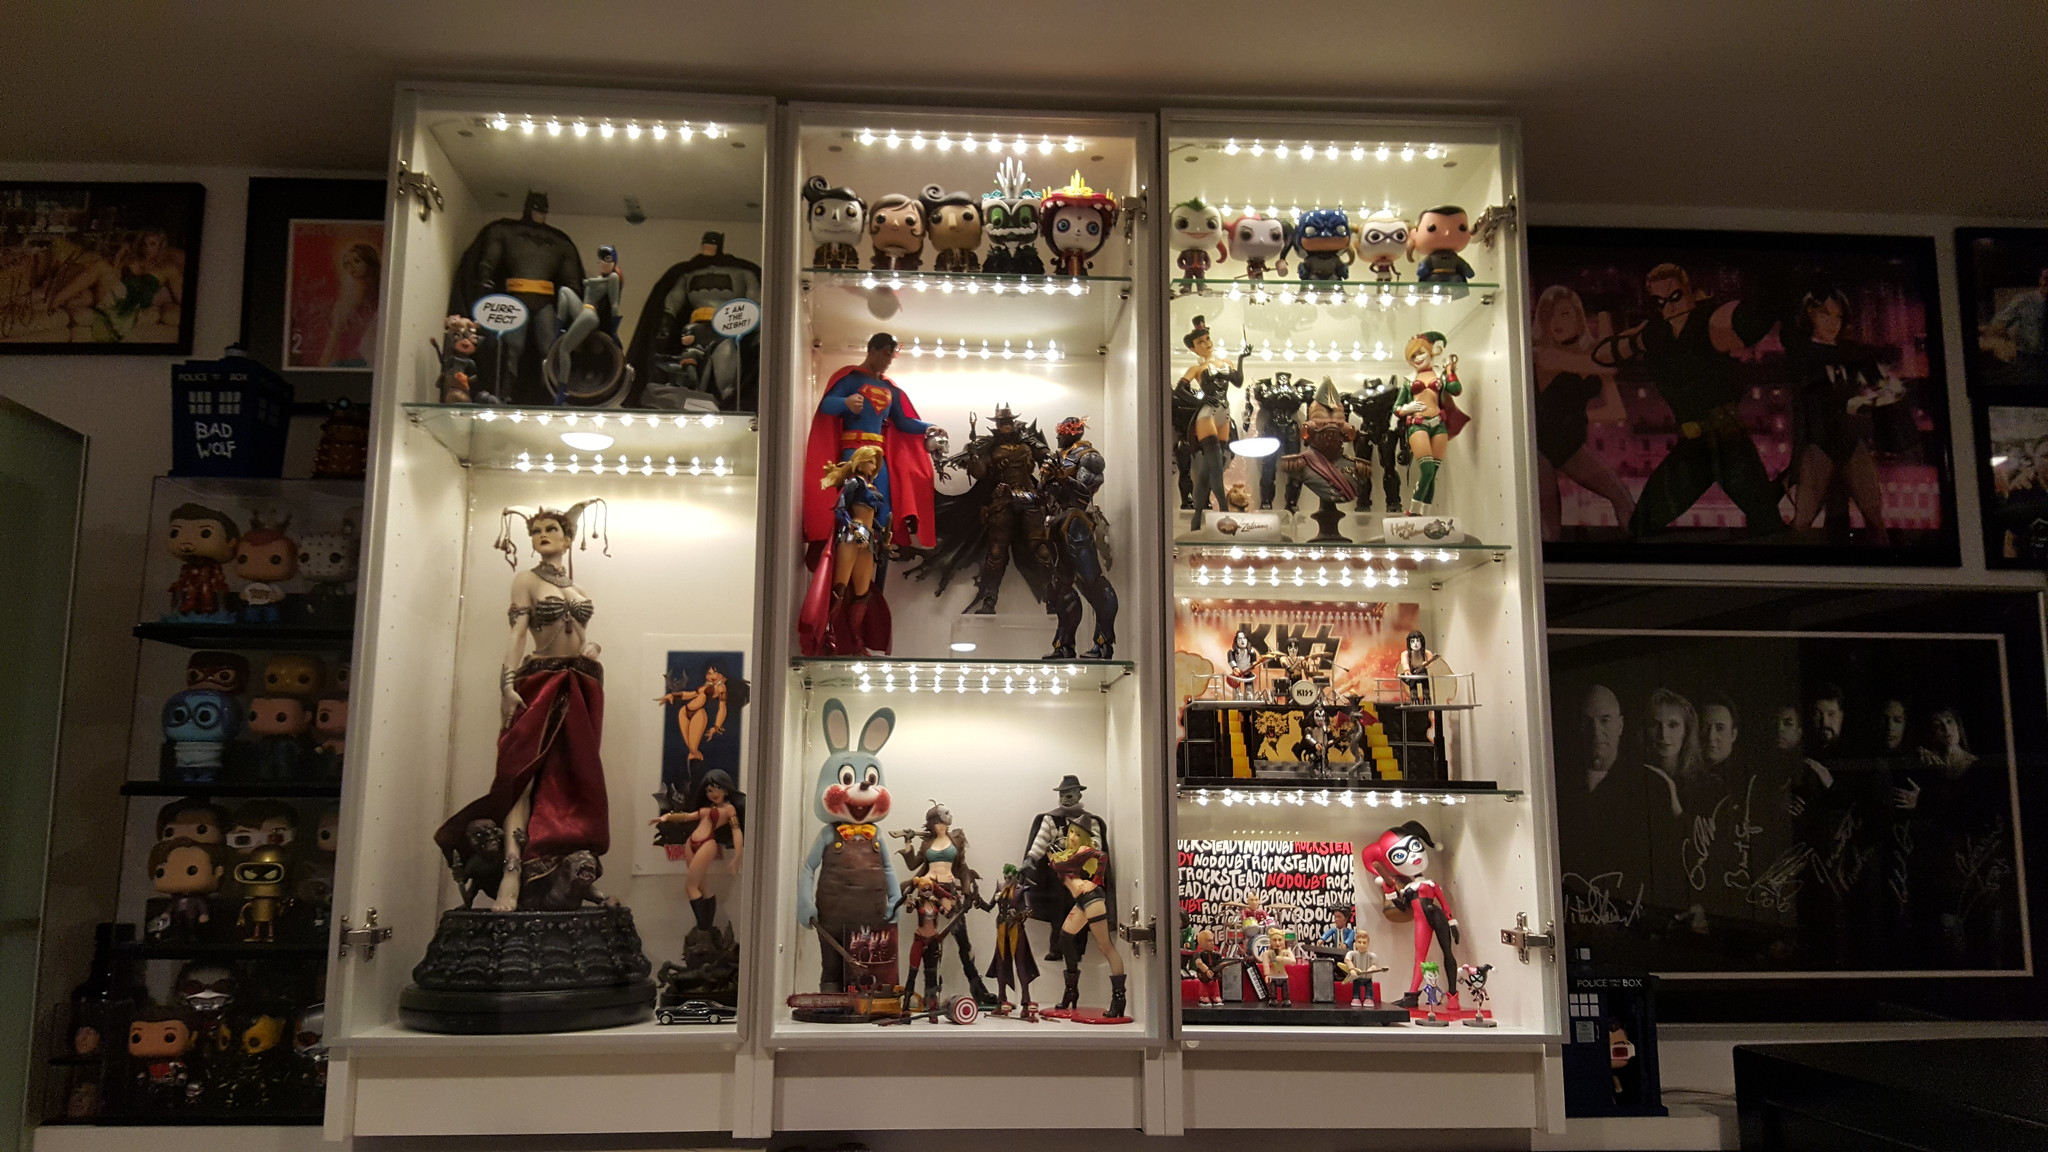 80 Toy Action Figure Shelves - 20860387945_7bf0ed6f12_k_Wonderful 80 Toy Action Figure Shelves - 20860387945_7bf0ed6f12_k  Collection_447720.jpg